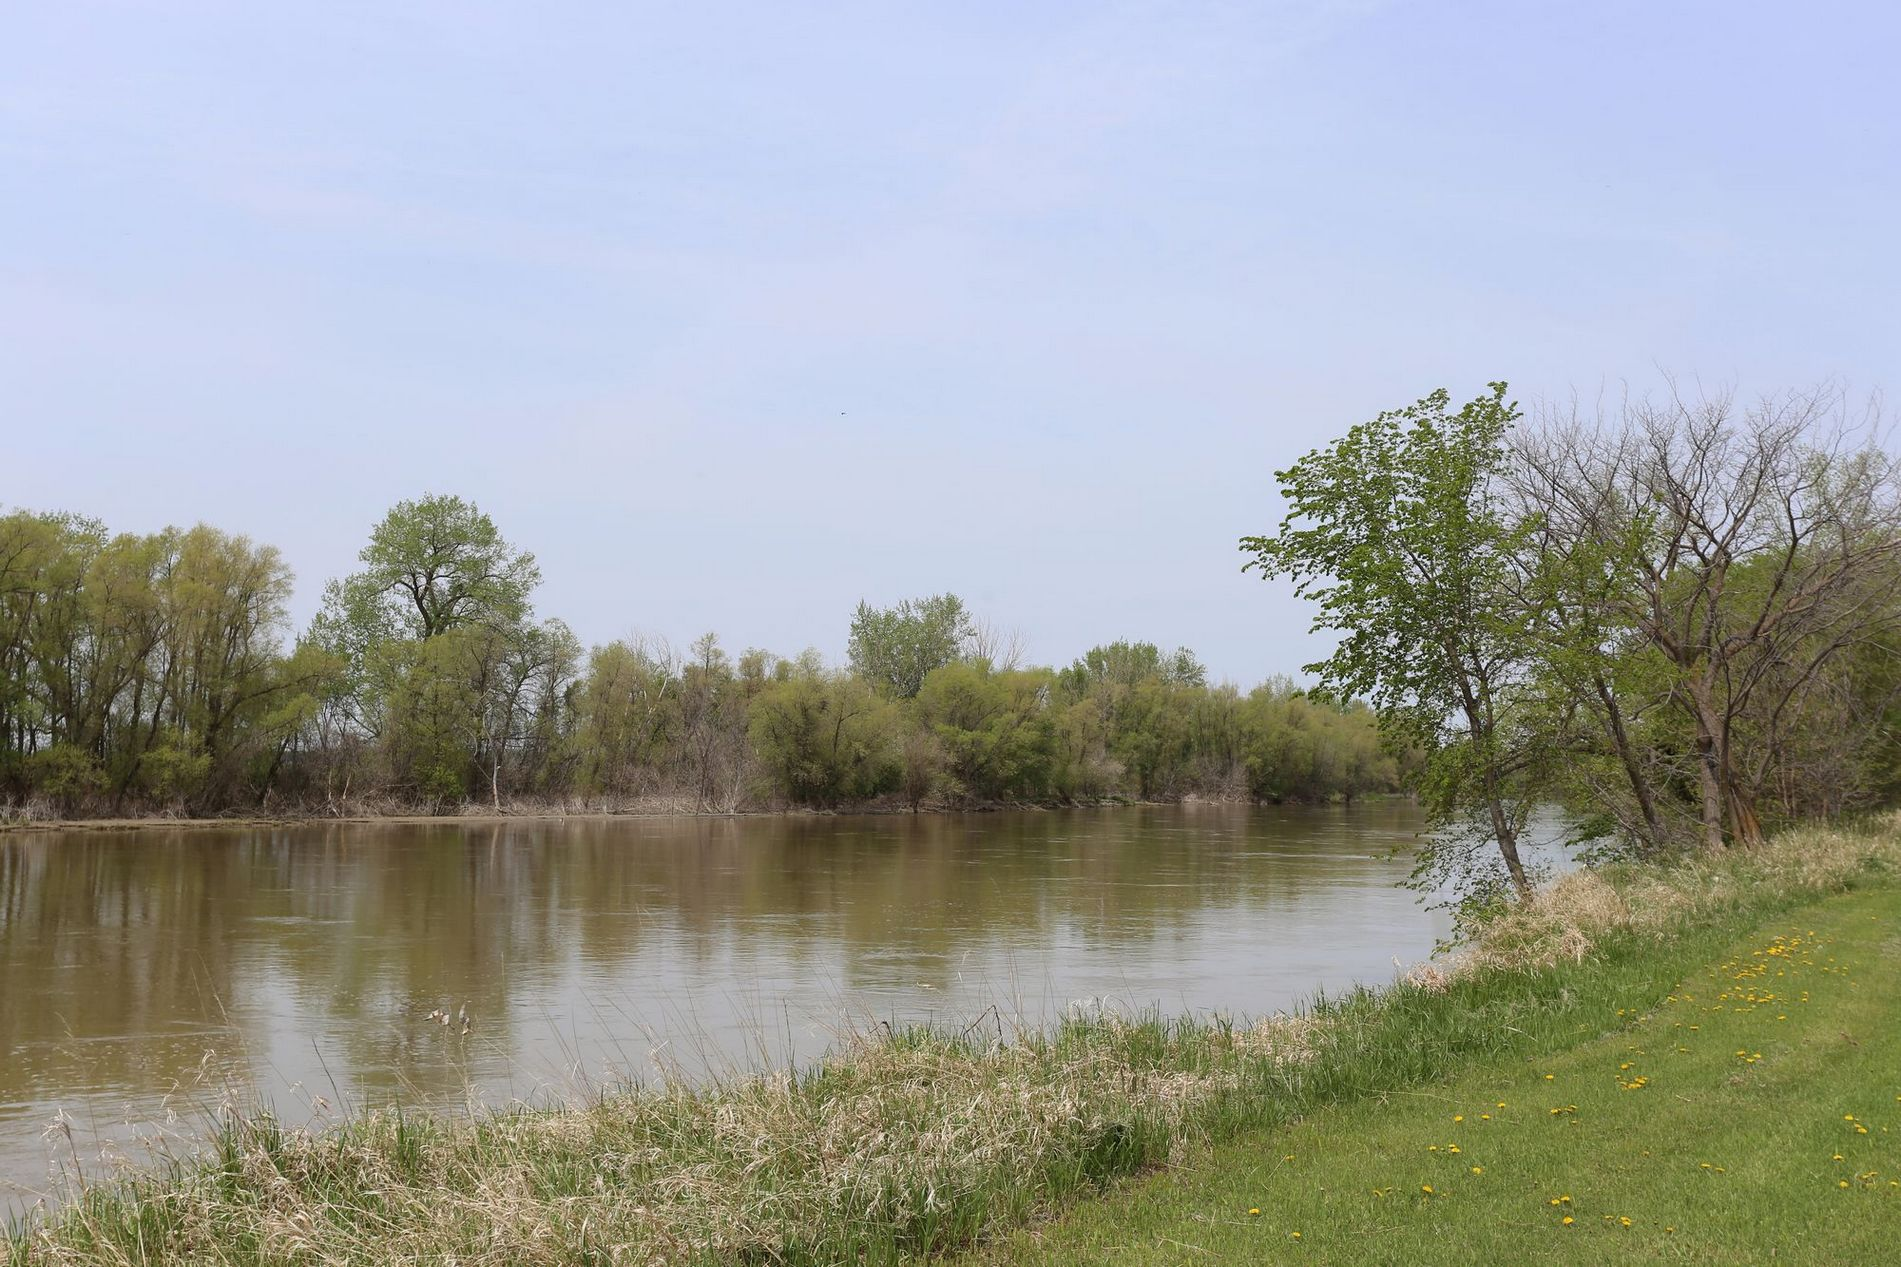 2804-Hwy 26-St Francois Xavier-Mb, Winnipeg, Manitoba  R4L 1B4 - Photo 27 - 1514217